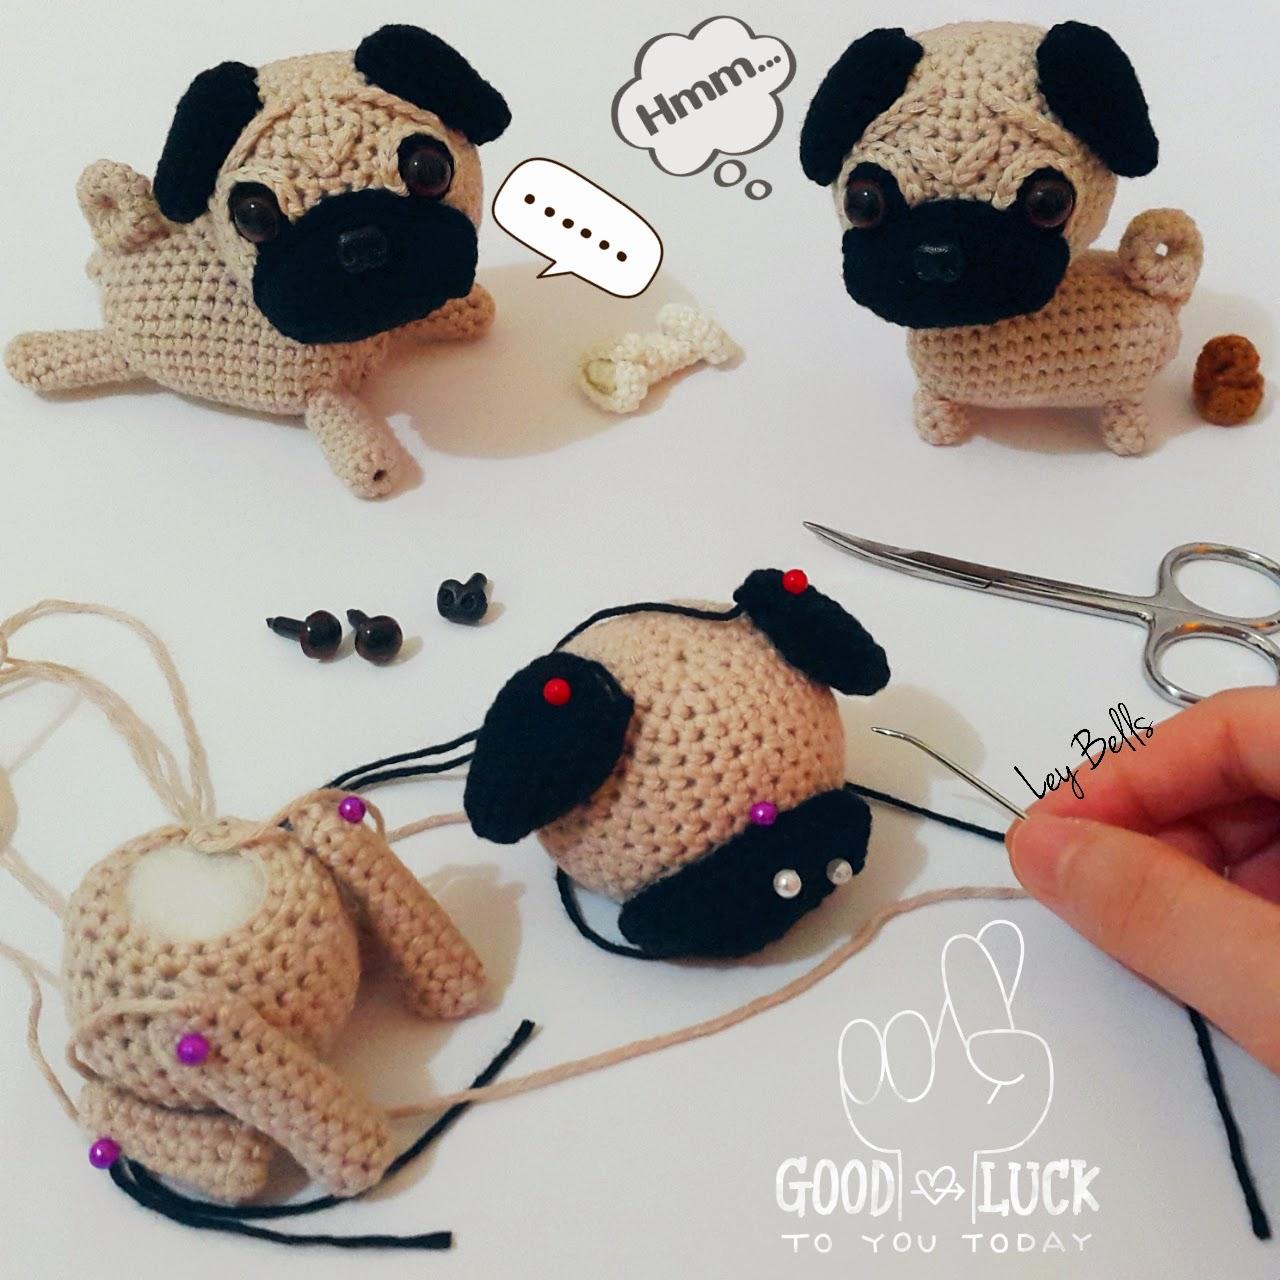 crochet pug amigurumi cute dog plush by mohustore on Etsy ... | 1280x1280